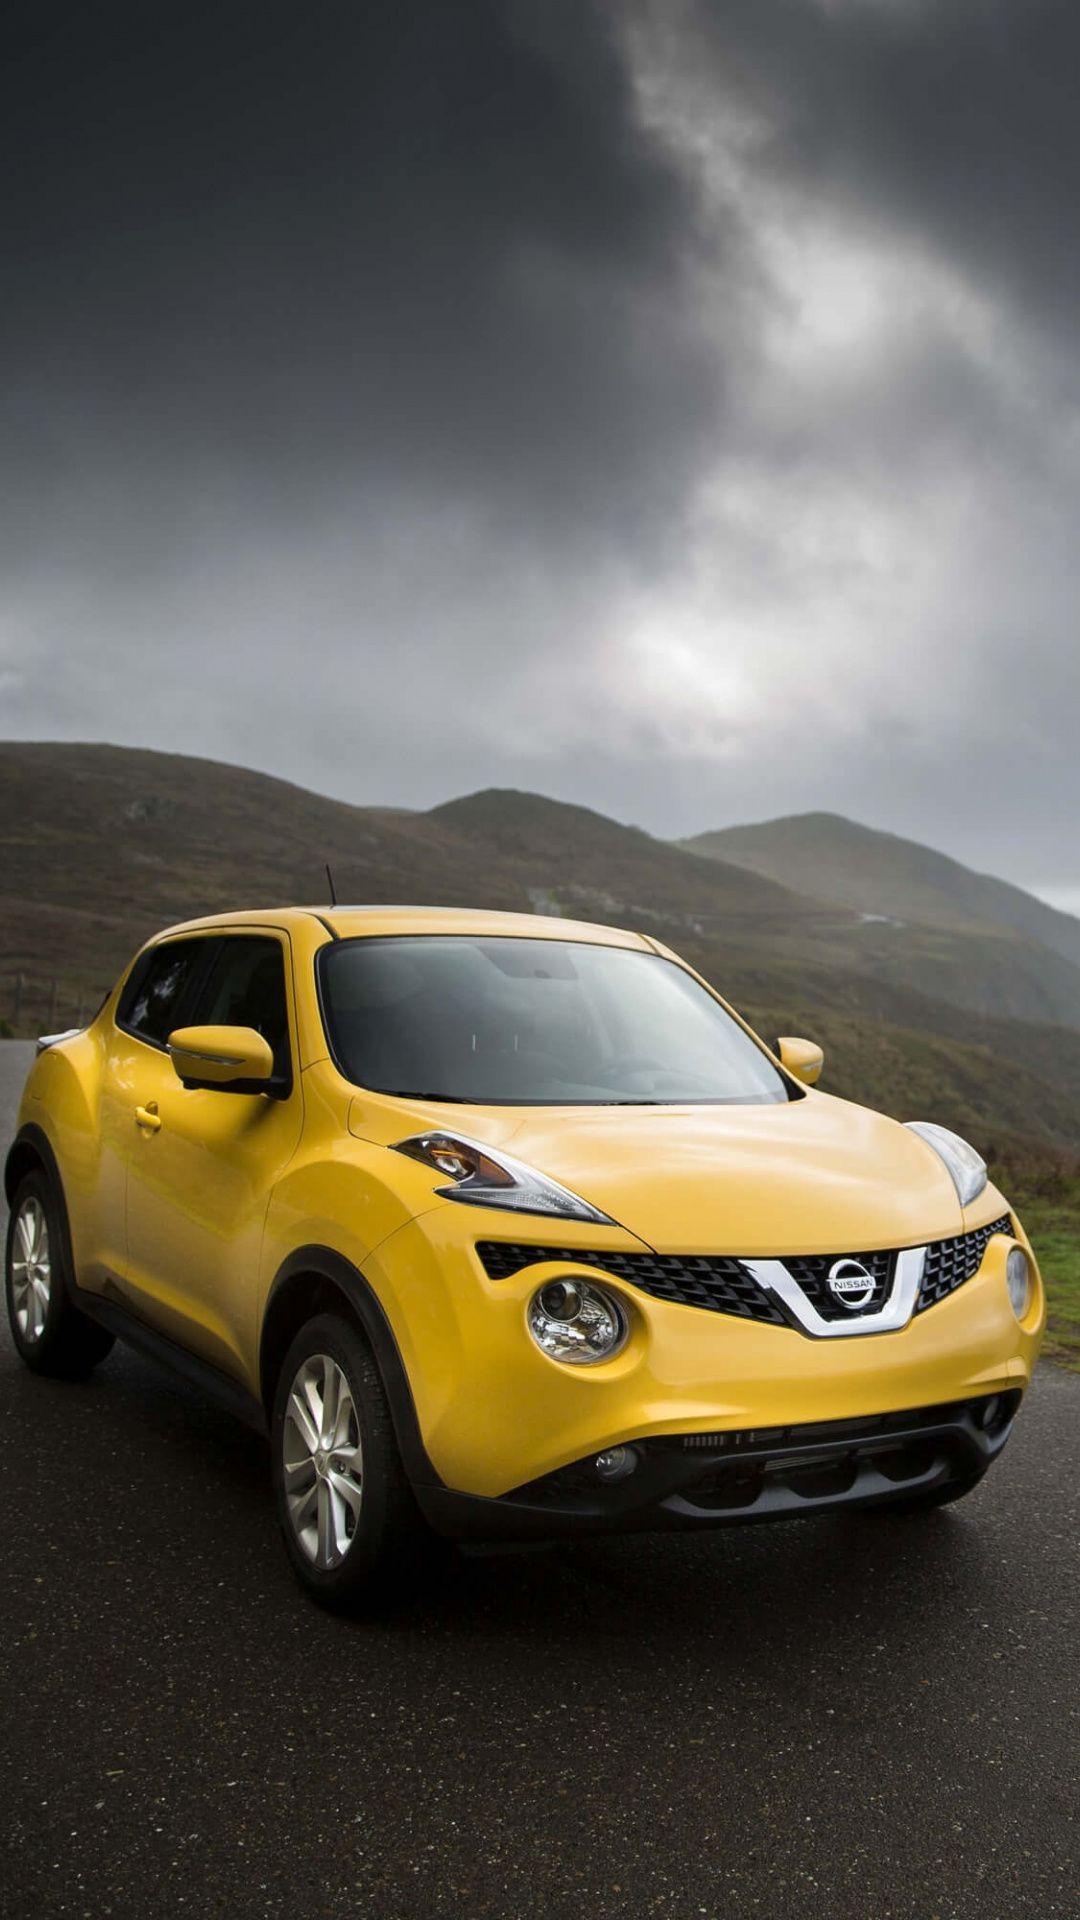 Yellow Nissan Juke Off Road Wallpaper Nissan Juke Nissan